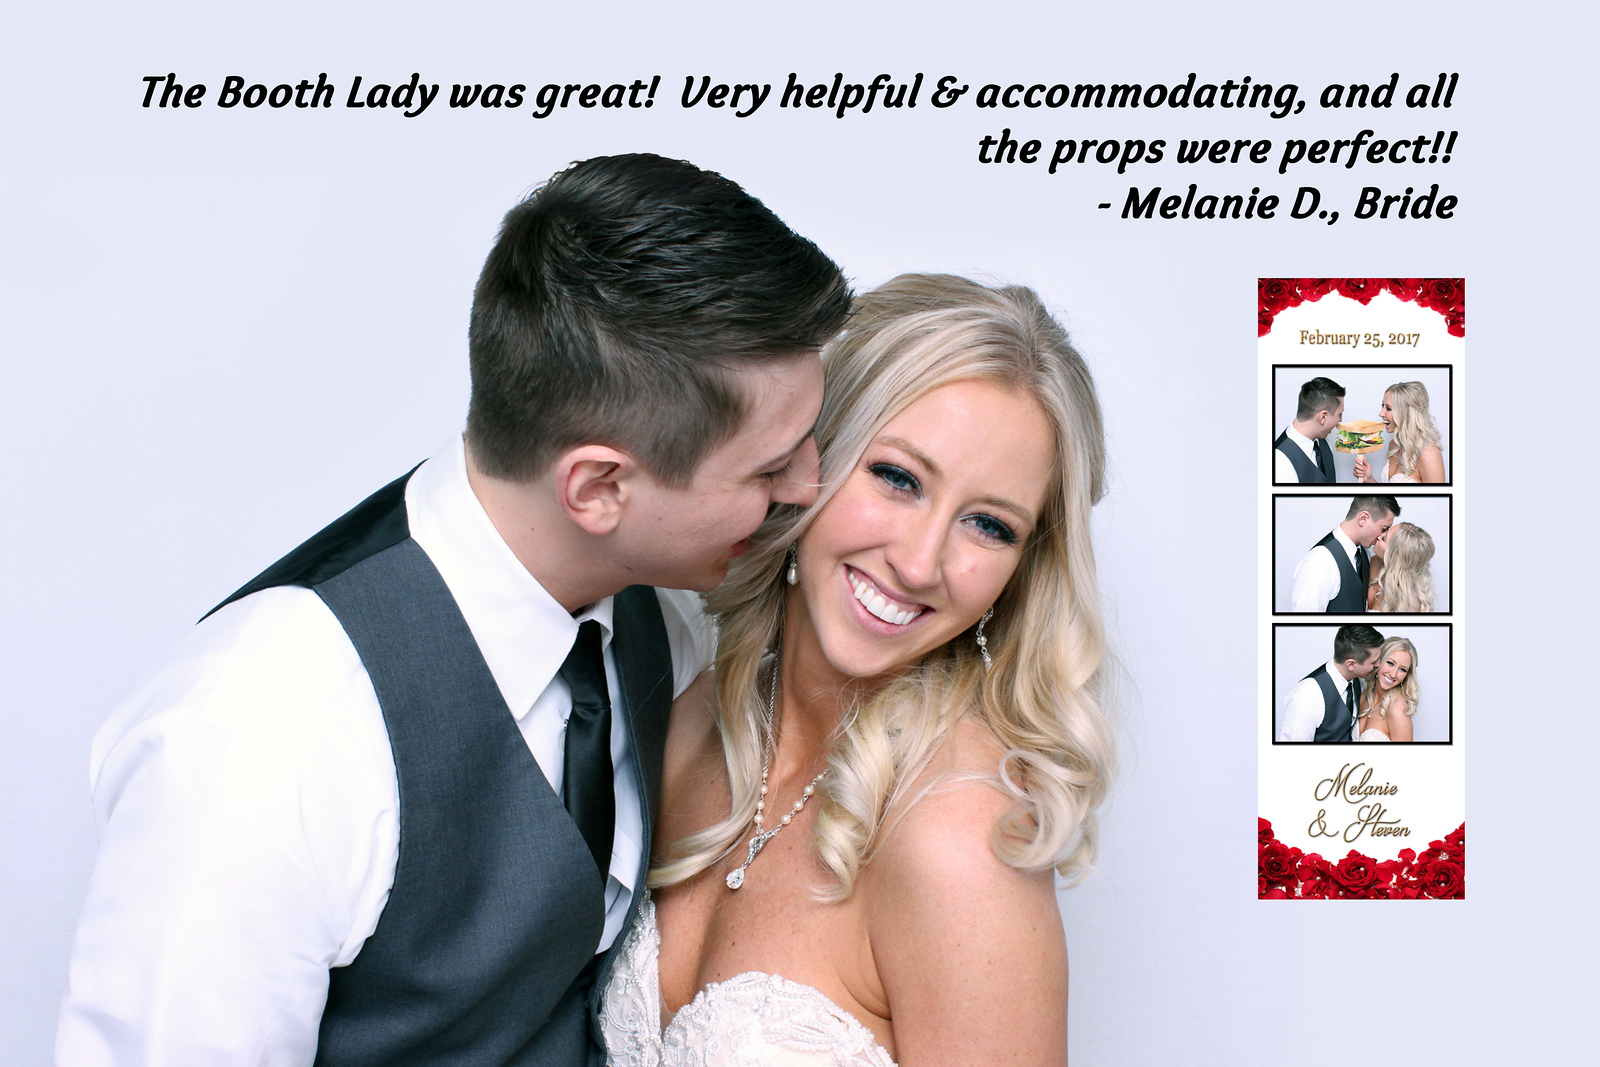 Melanie & Steven's Wedding Reception